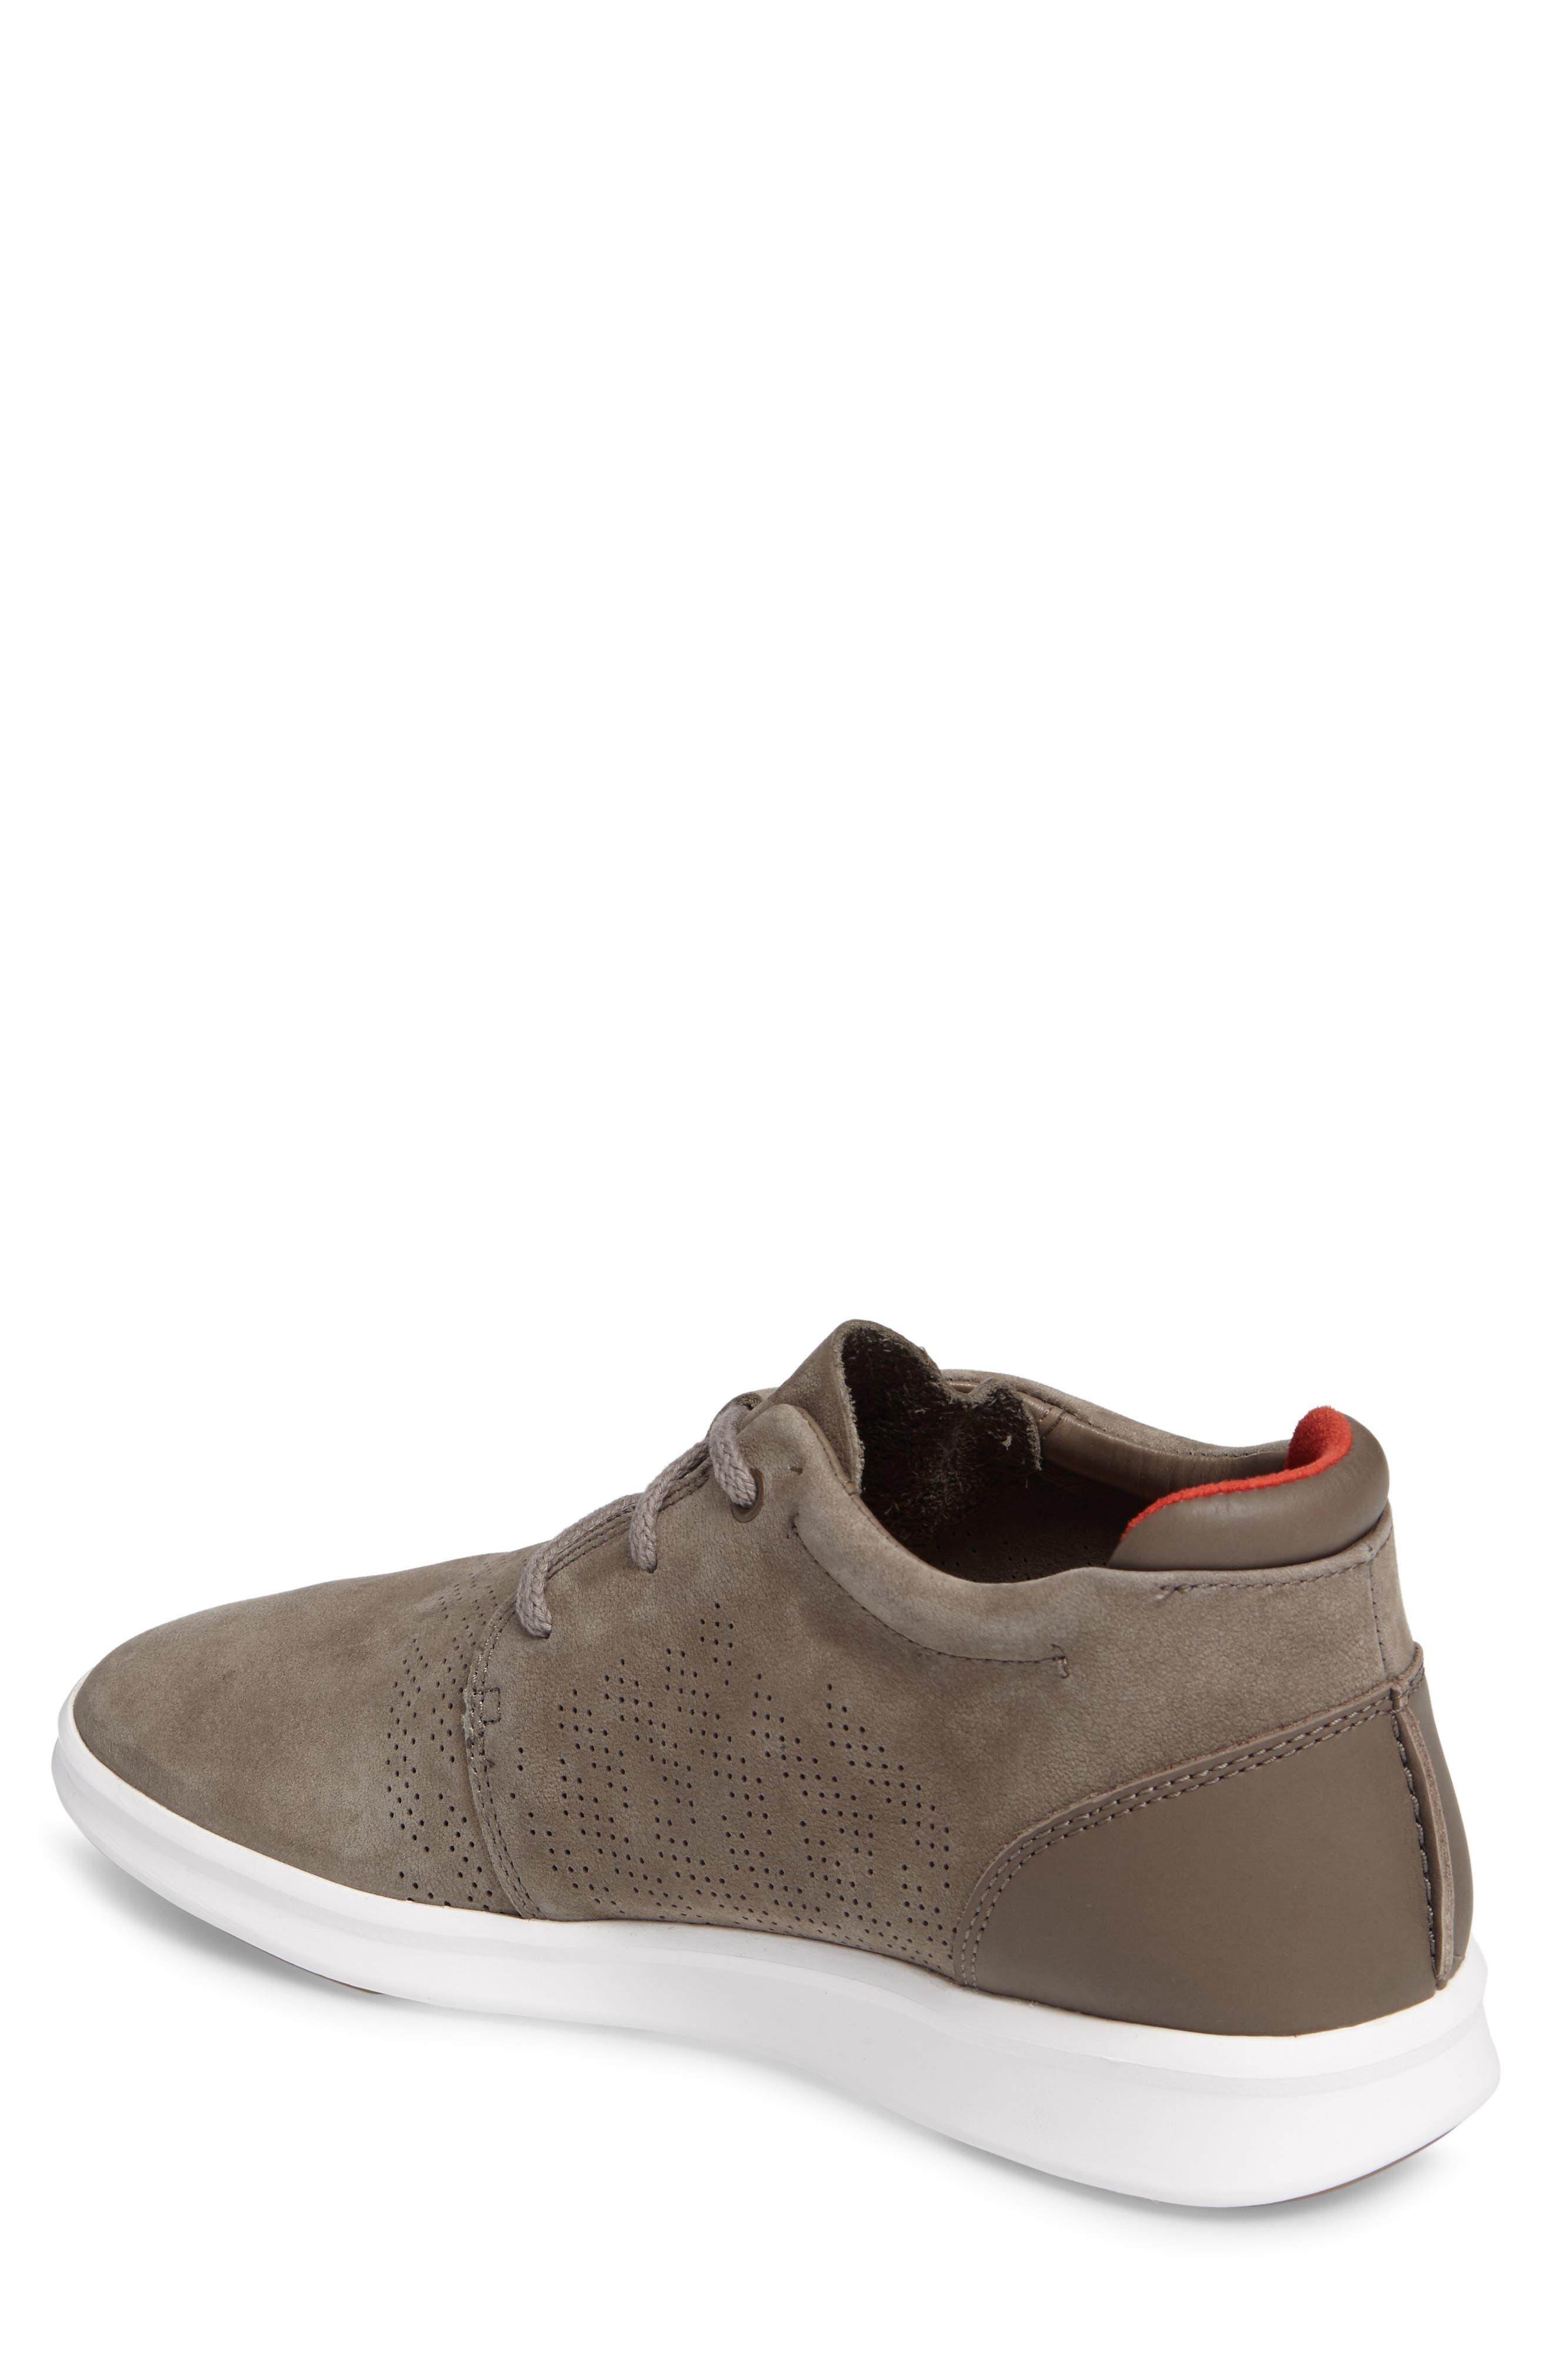 Larken Chukka Sneaker,                             Alternate thumbnail 2, color,                             Mole